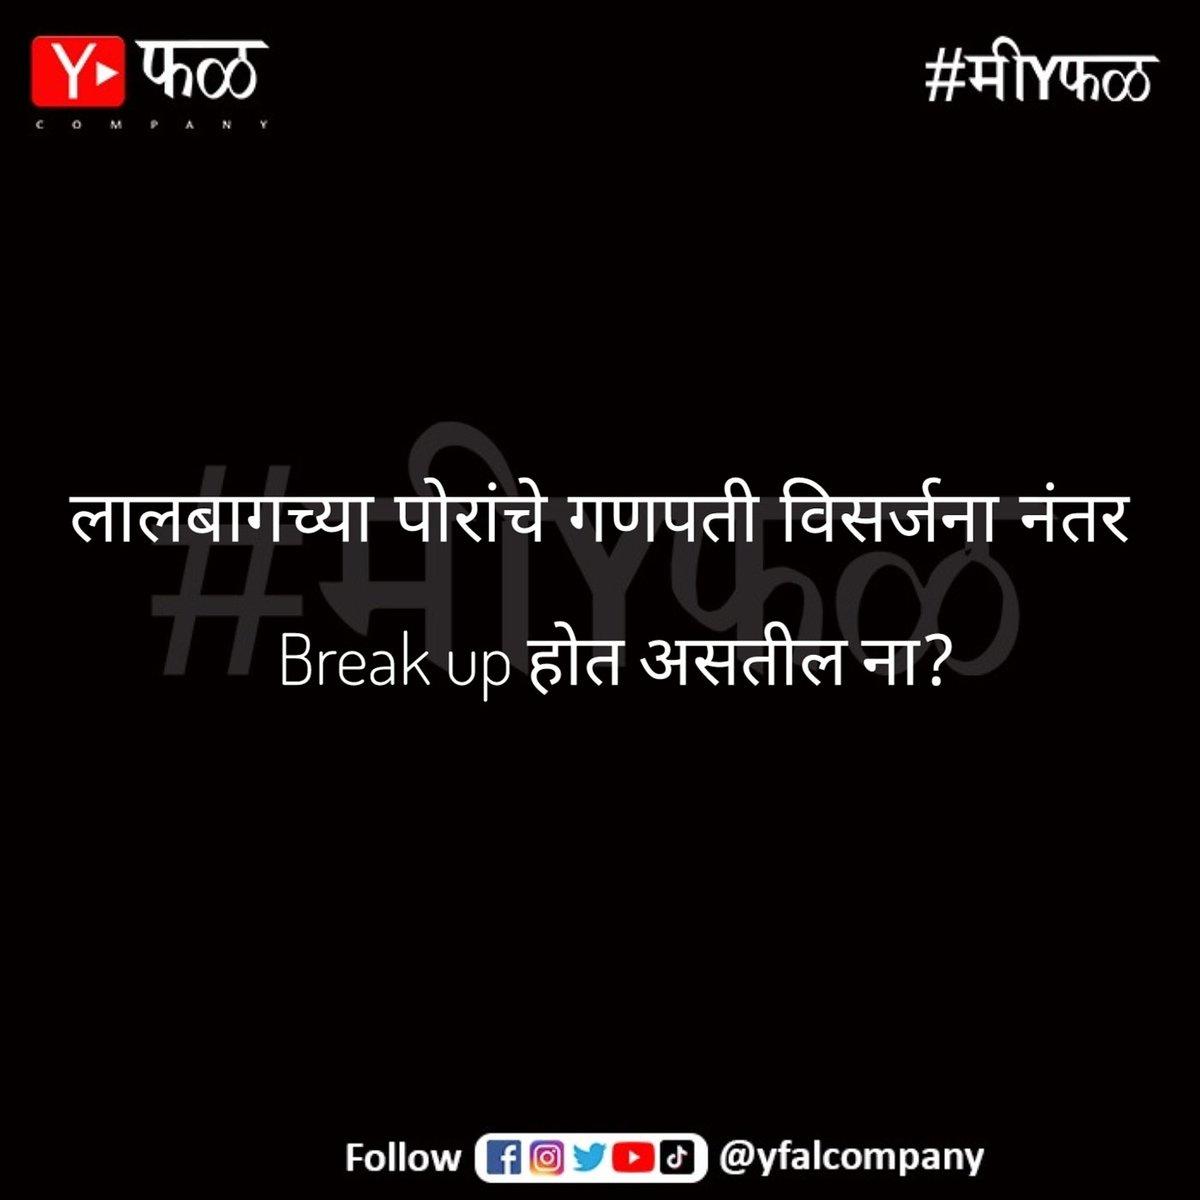 #मीYफळ #YFalCompany #Lalbaug #lalbaughcharaja #ganeshgalli #ganpati #ganpatibappamorya  #marathicomedy #MarathiMemes #marathiactors #maharashtramaza #maharashtra  #mumbai #mimarathi #मराठी #marathibana #bf #gf #couplegoals #covıd19 #lockdownlife #Lockdownpic.twitter.com/huCuKGy2x4